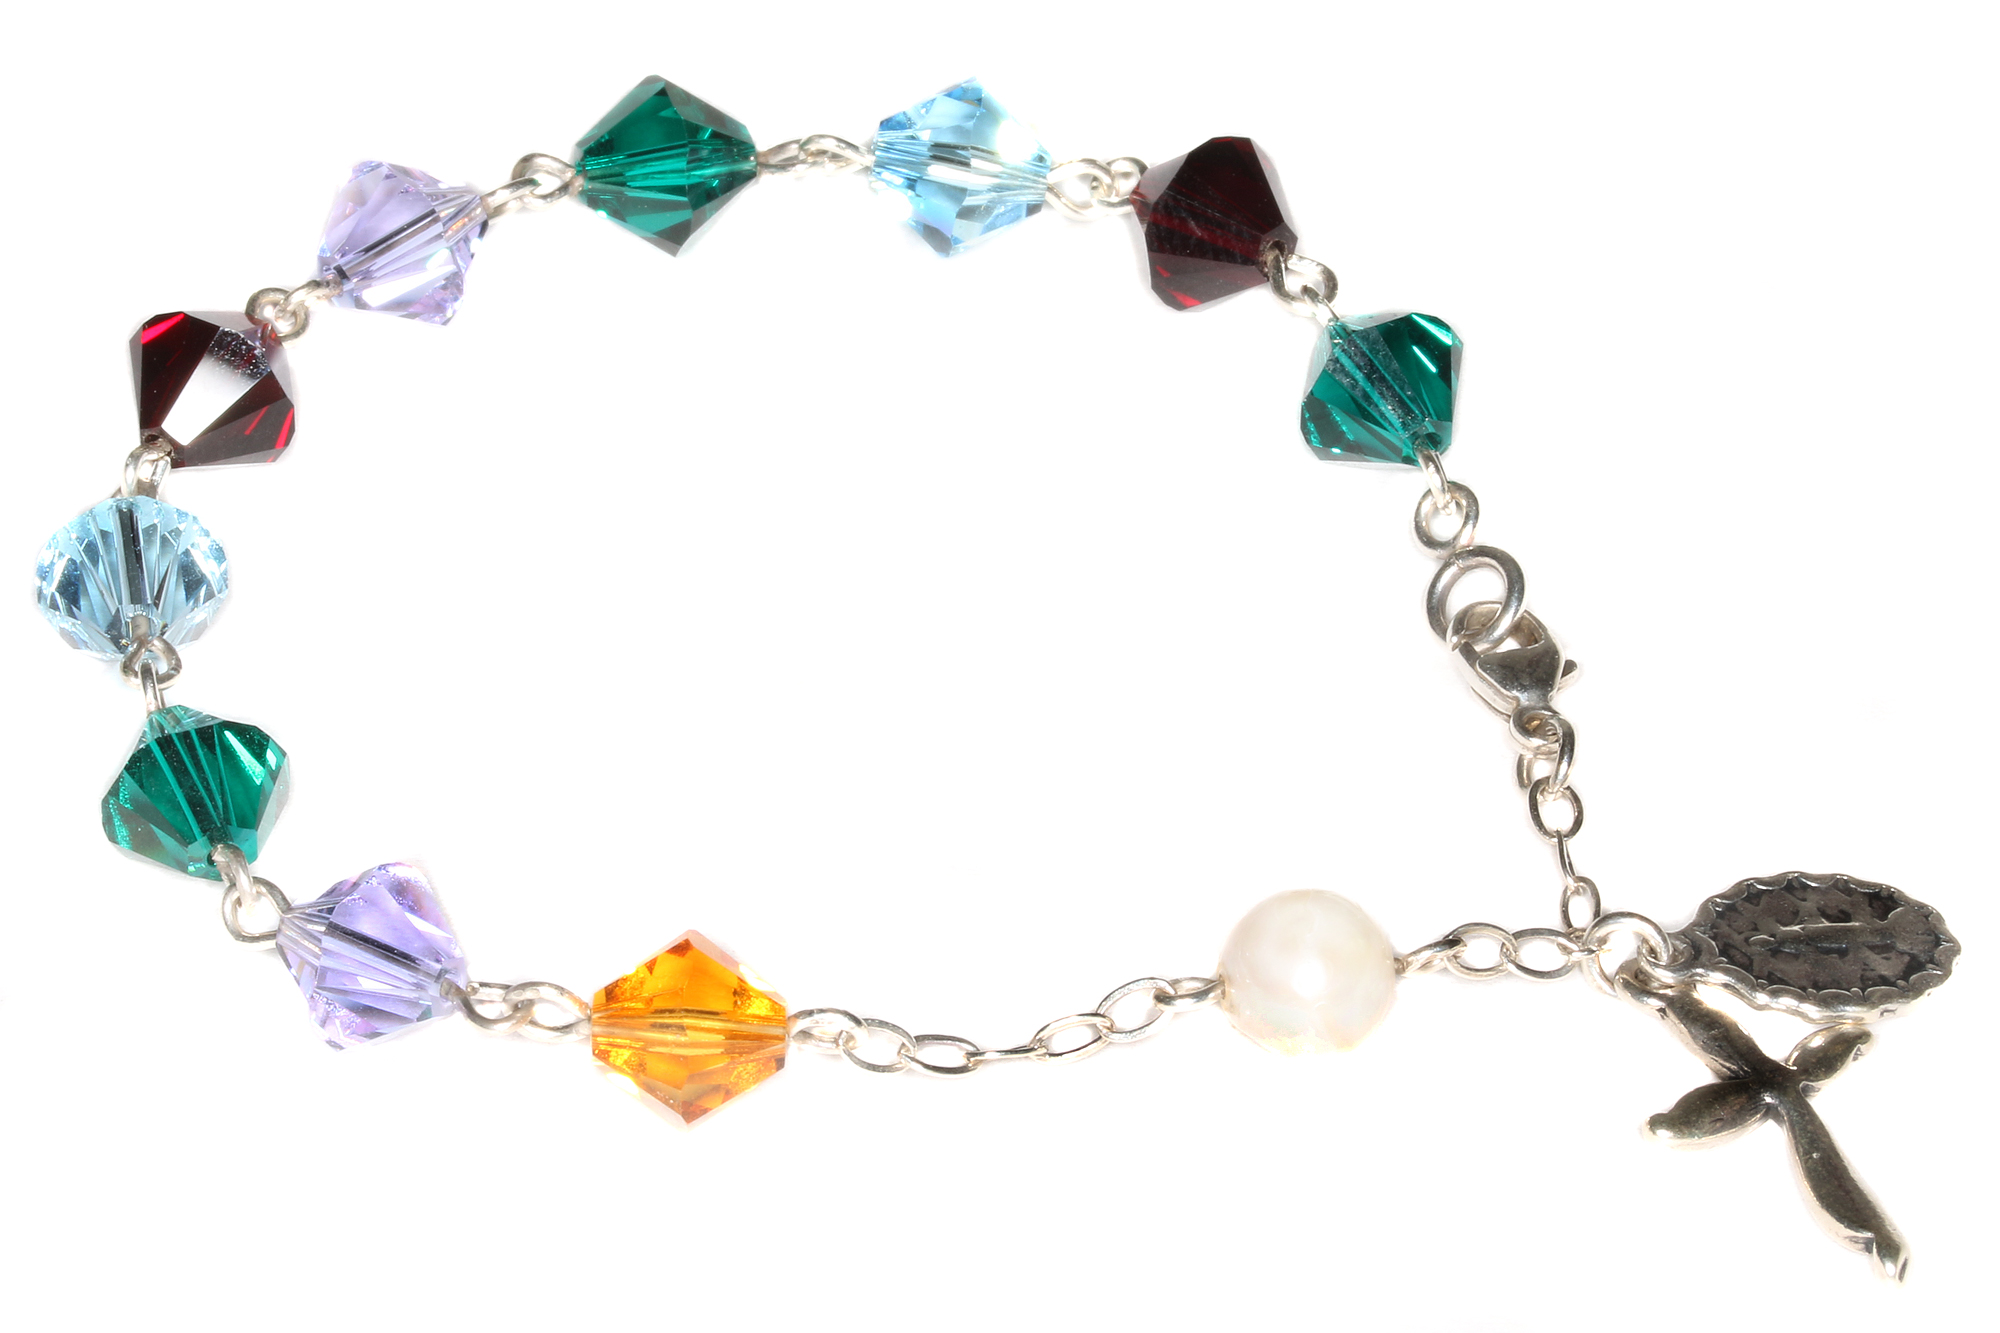 5ebdb29b5 Product Description. Aquamarine Swarovski Crystal Rosary Bracelet ...